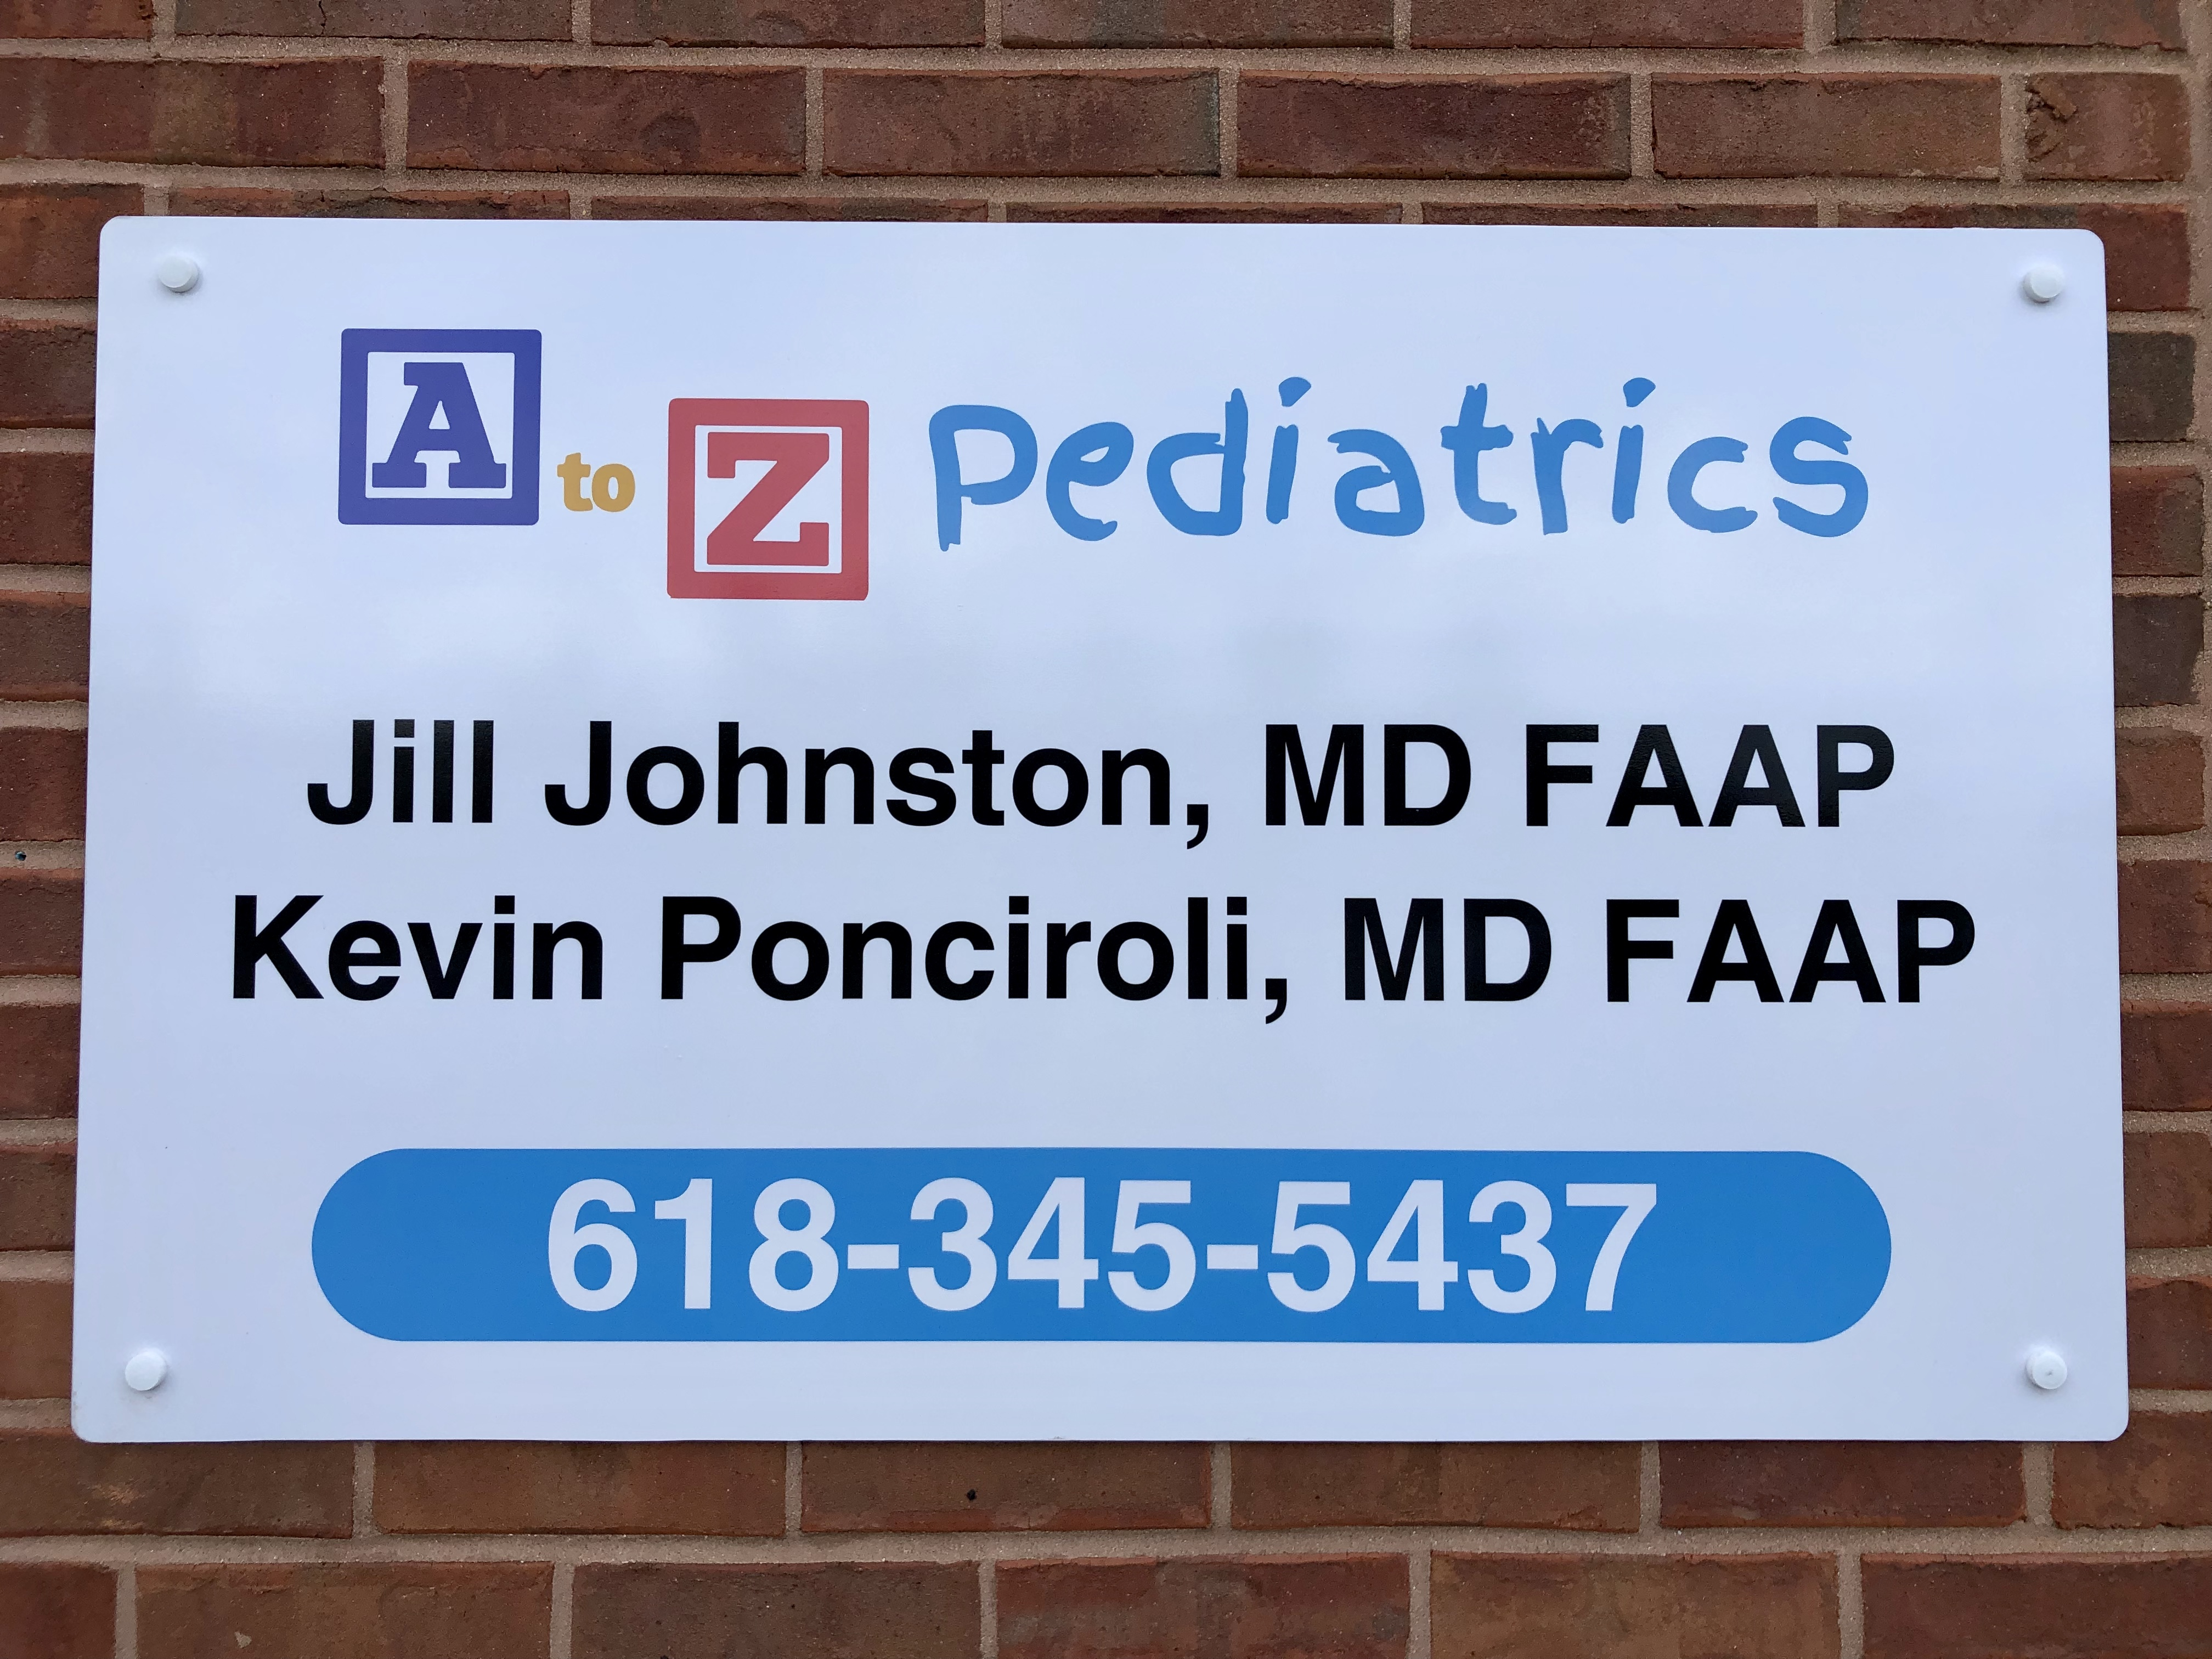 "A to Z Pediatrics, LLC – ""Little Patients, Big Care!"